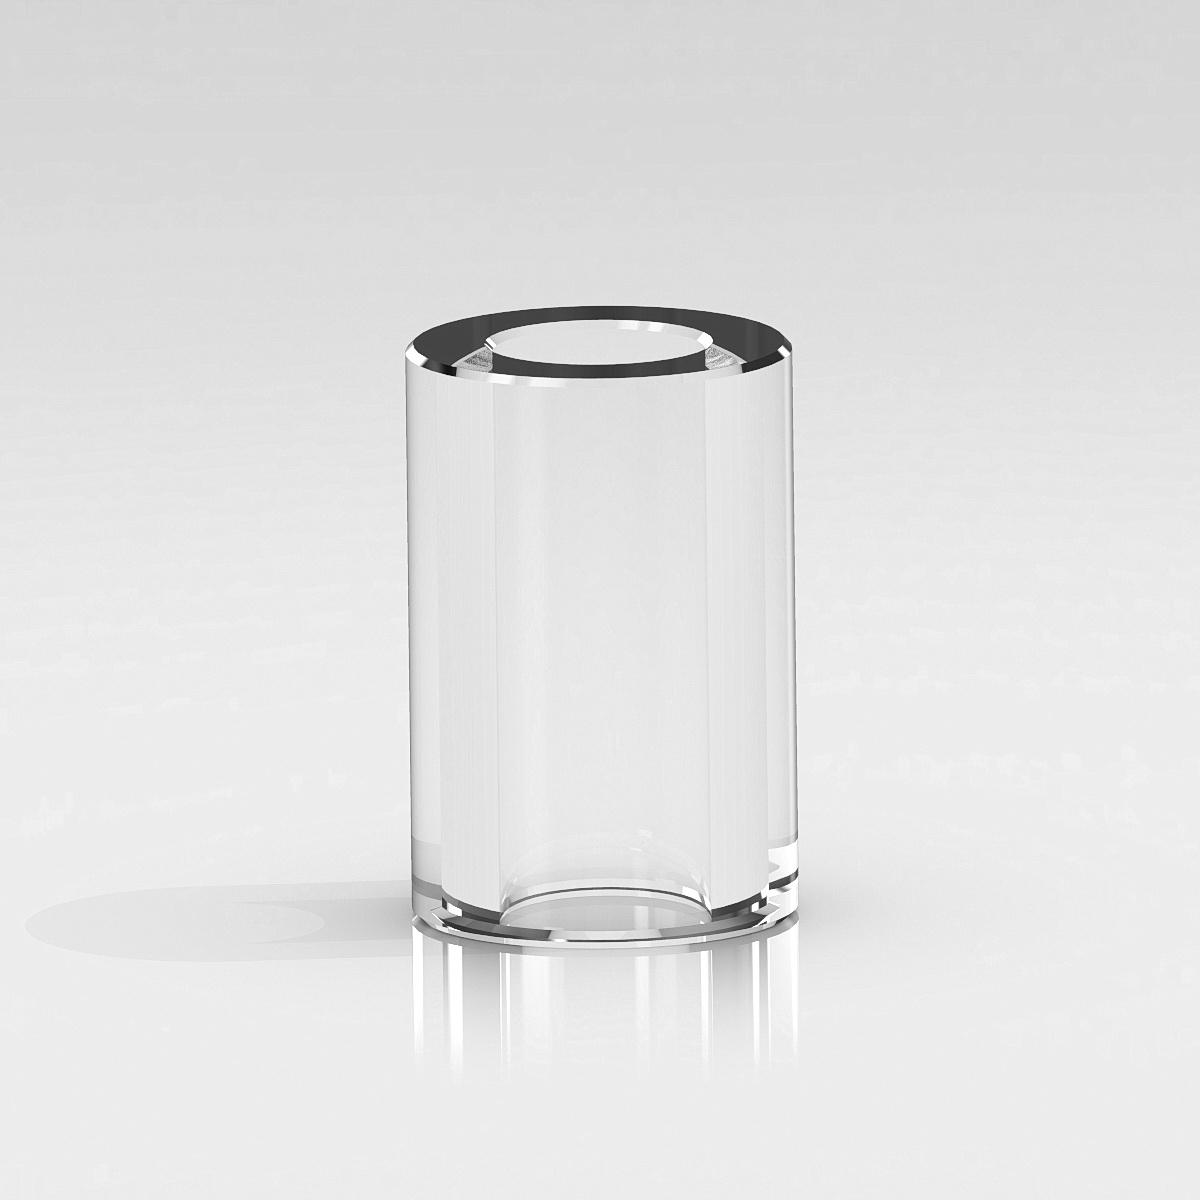 Clear Plastic Tubing, 3/8'' OD x 1/4'' ID x 3/4'' Length. (For 1/4-20 Stud)